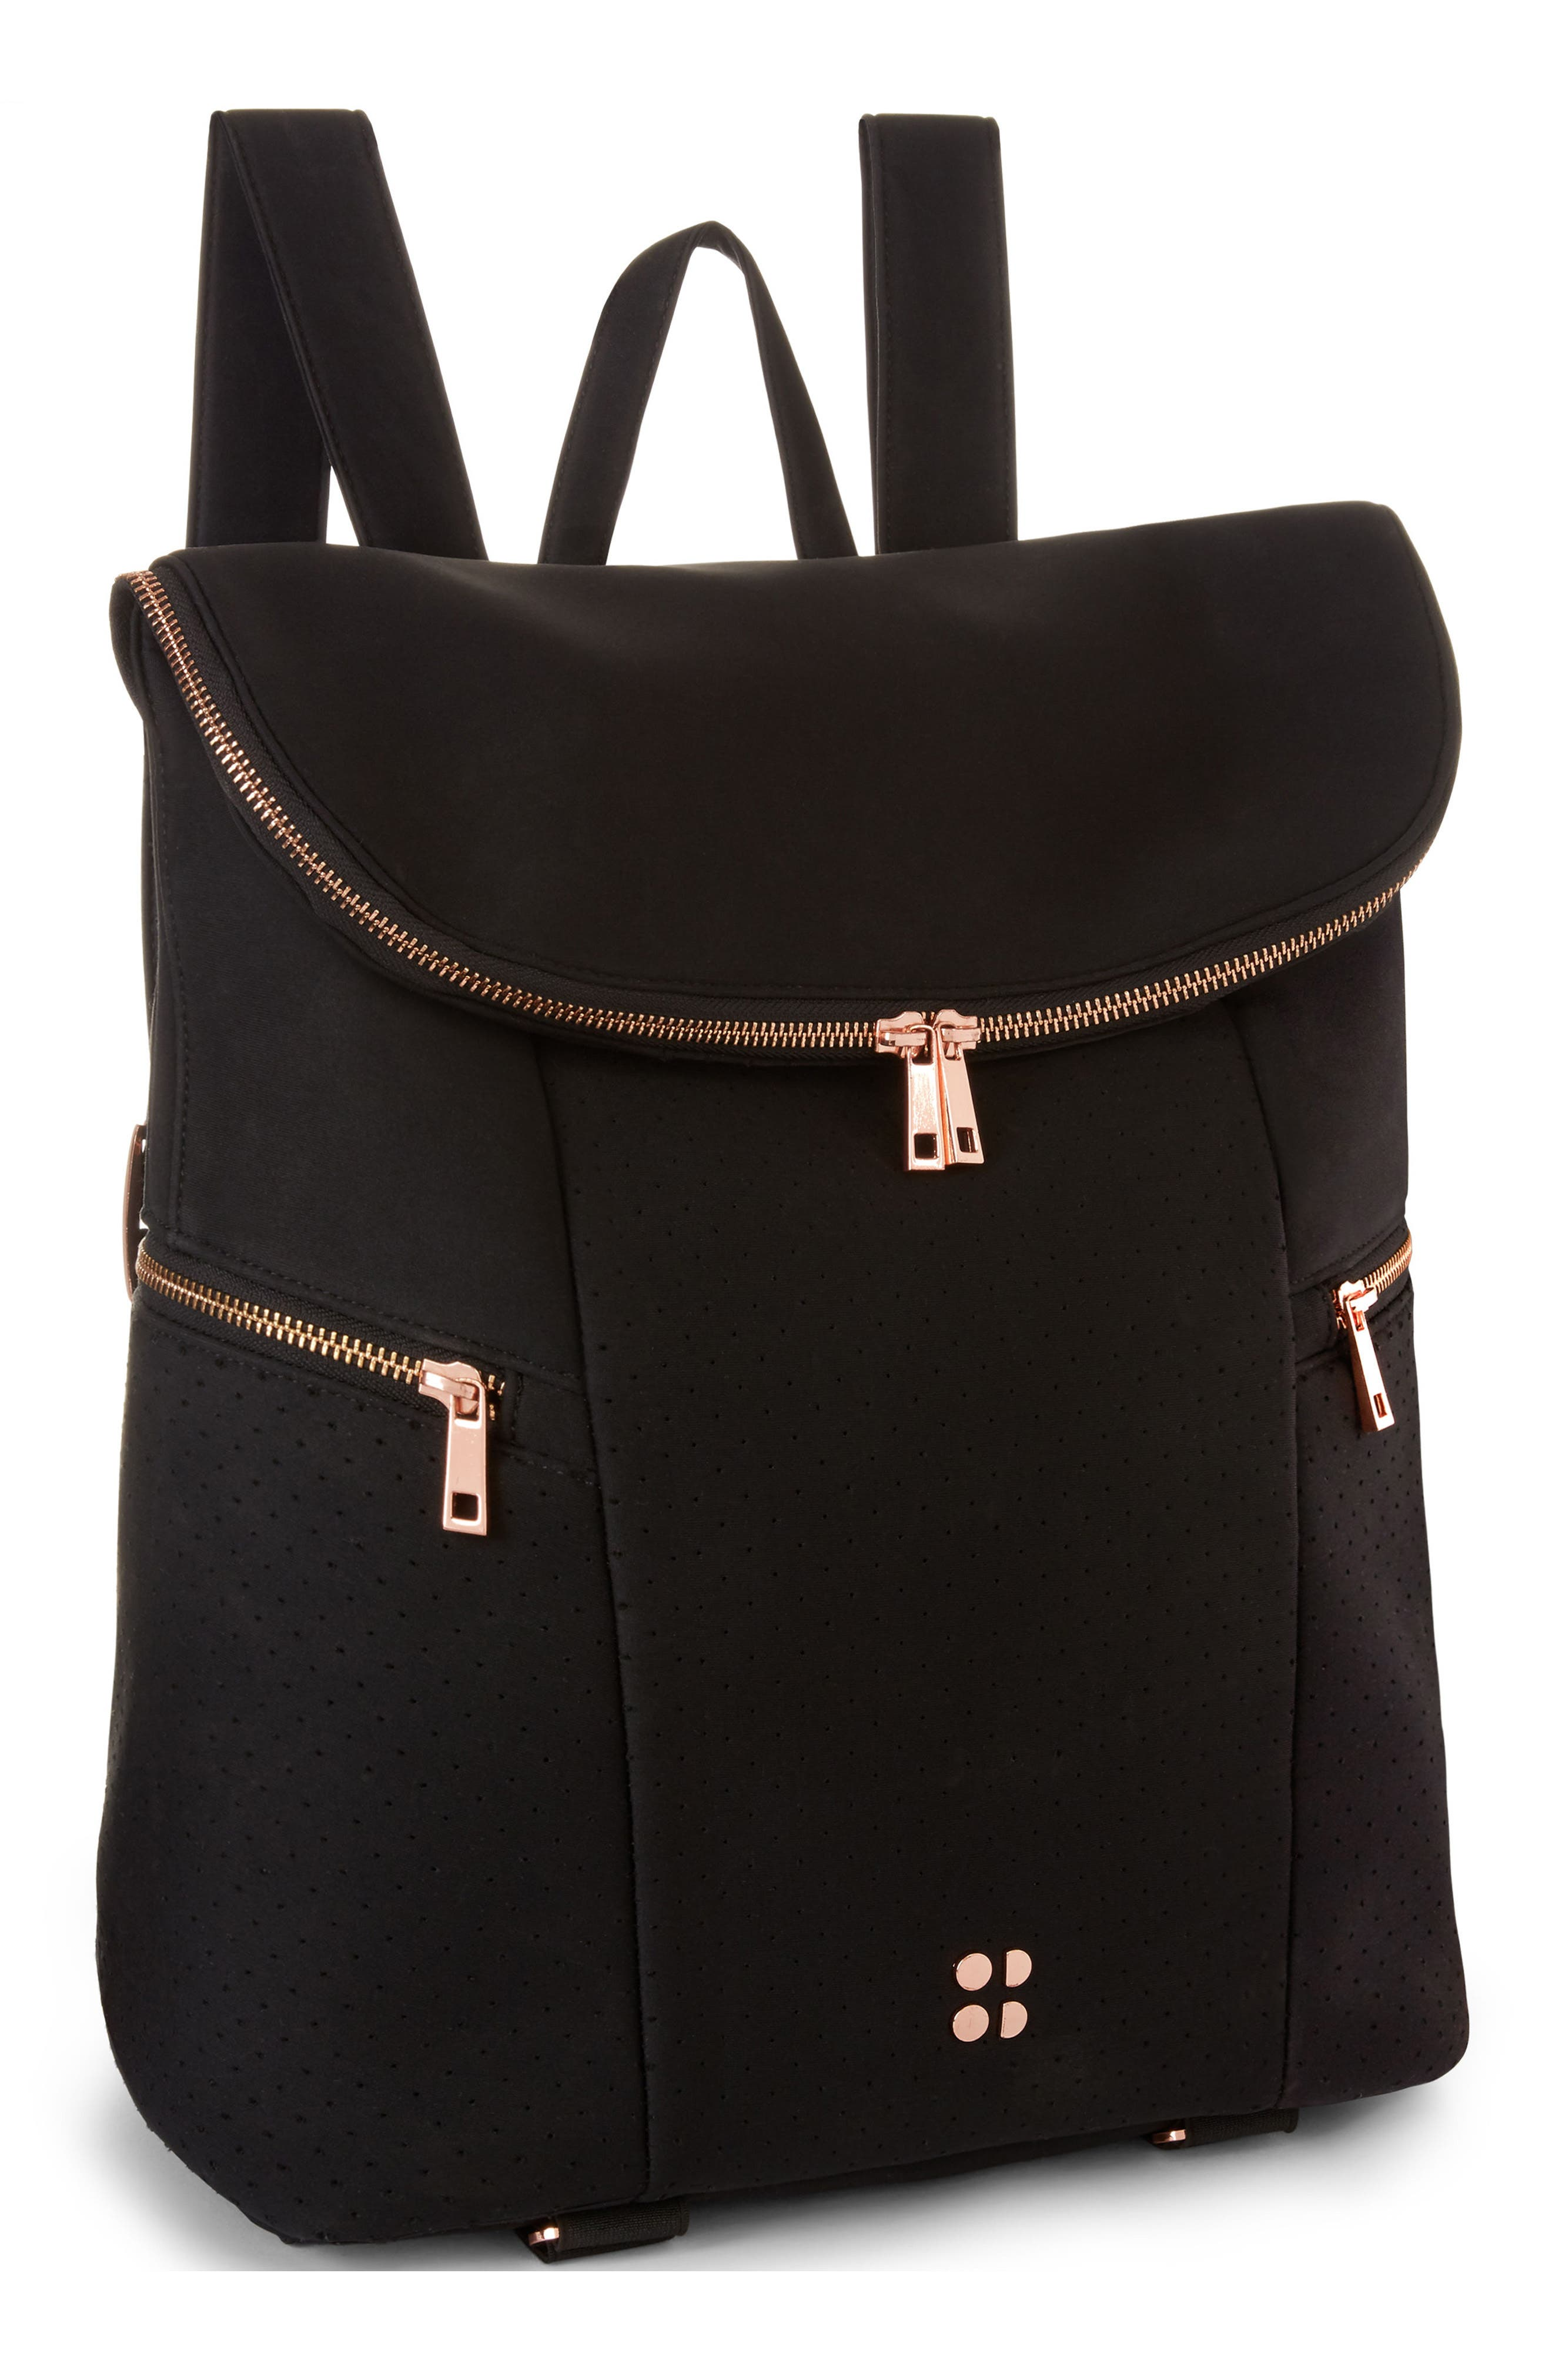 All Sport Backpack,                             Main thumbnail 1, color,                             Black